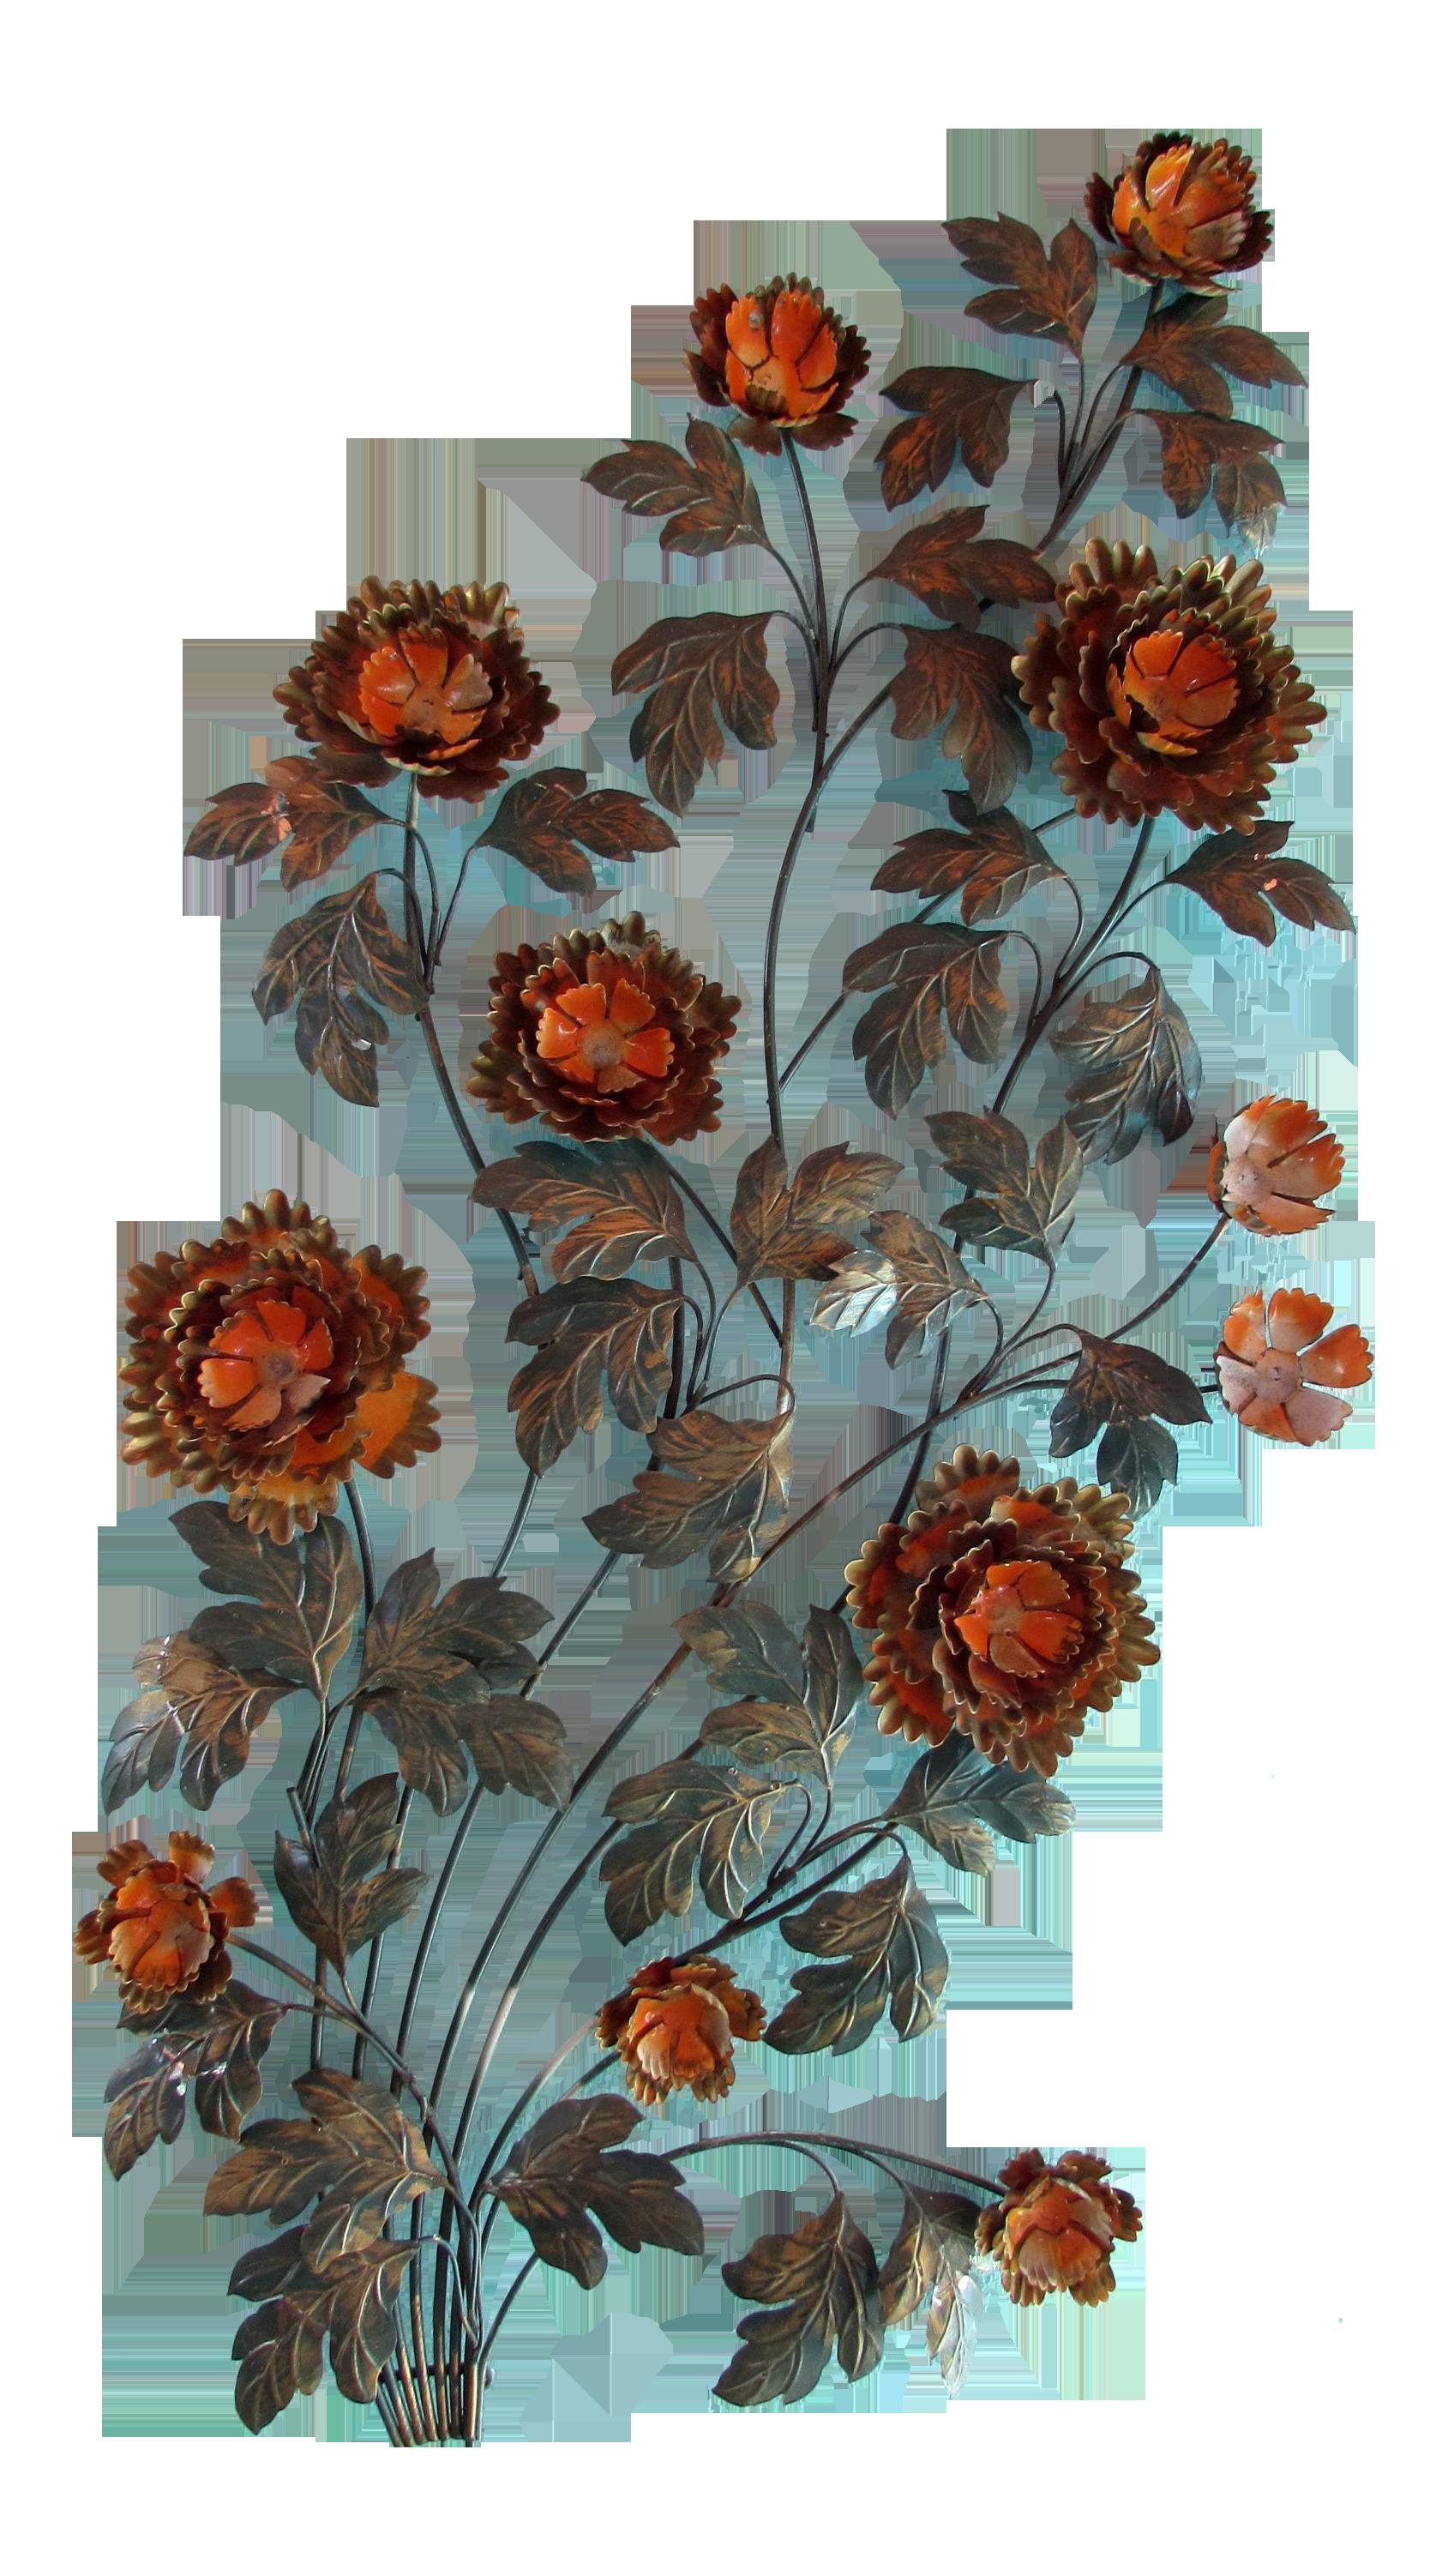 Pin By Mr Zaydi On Flower New Vintage Flower Tattoo Digital Flowers Botanical Flowers